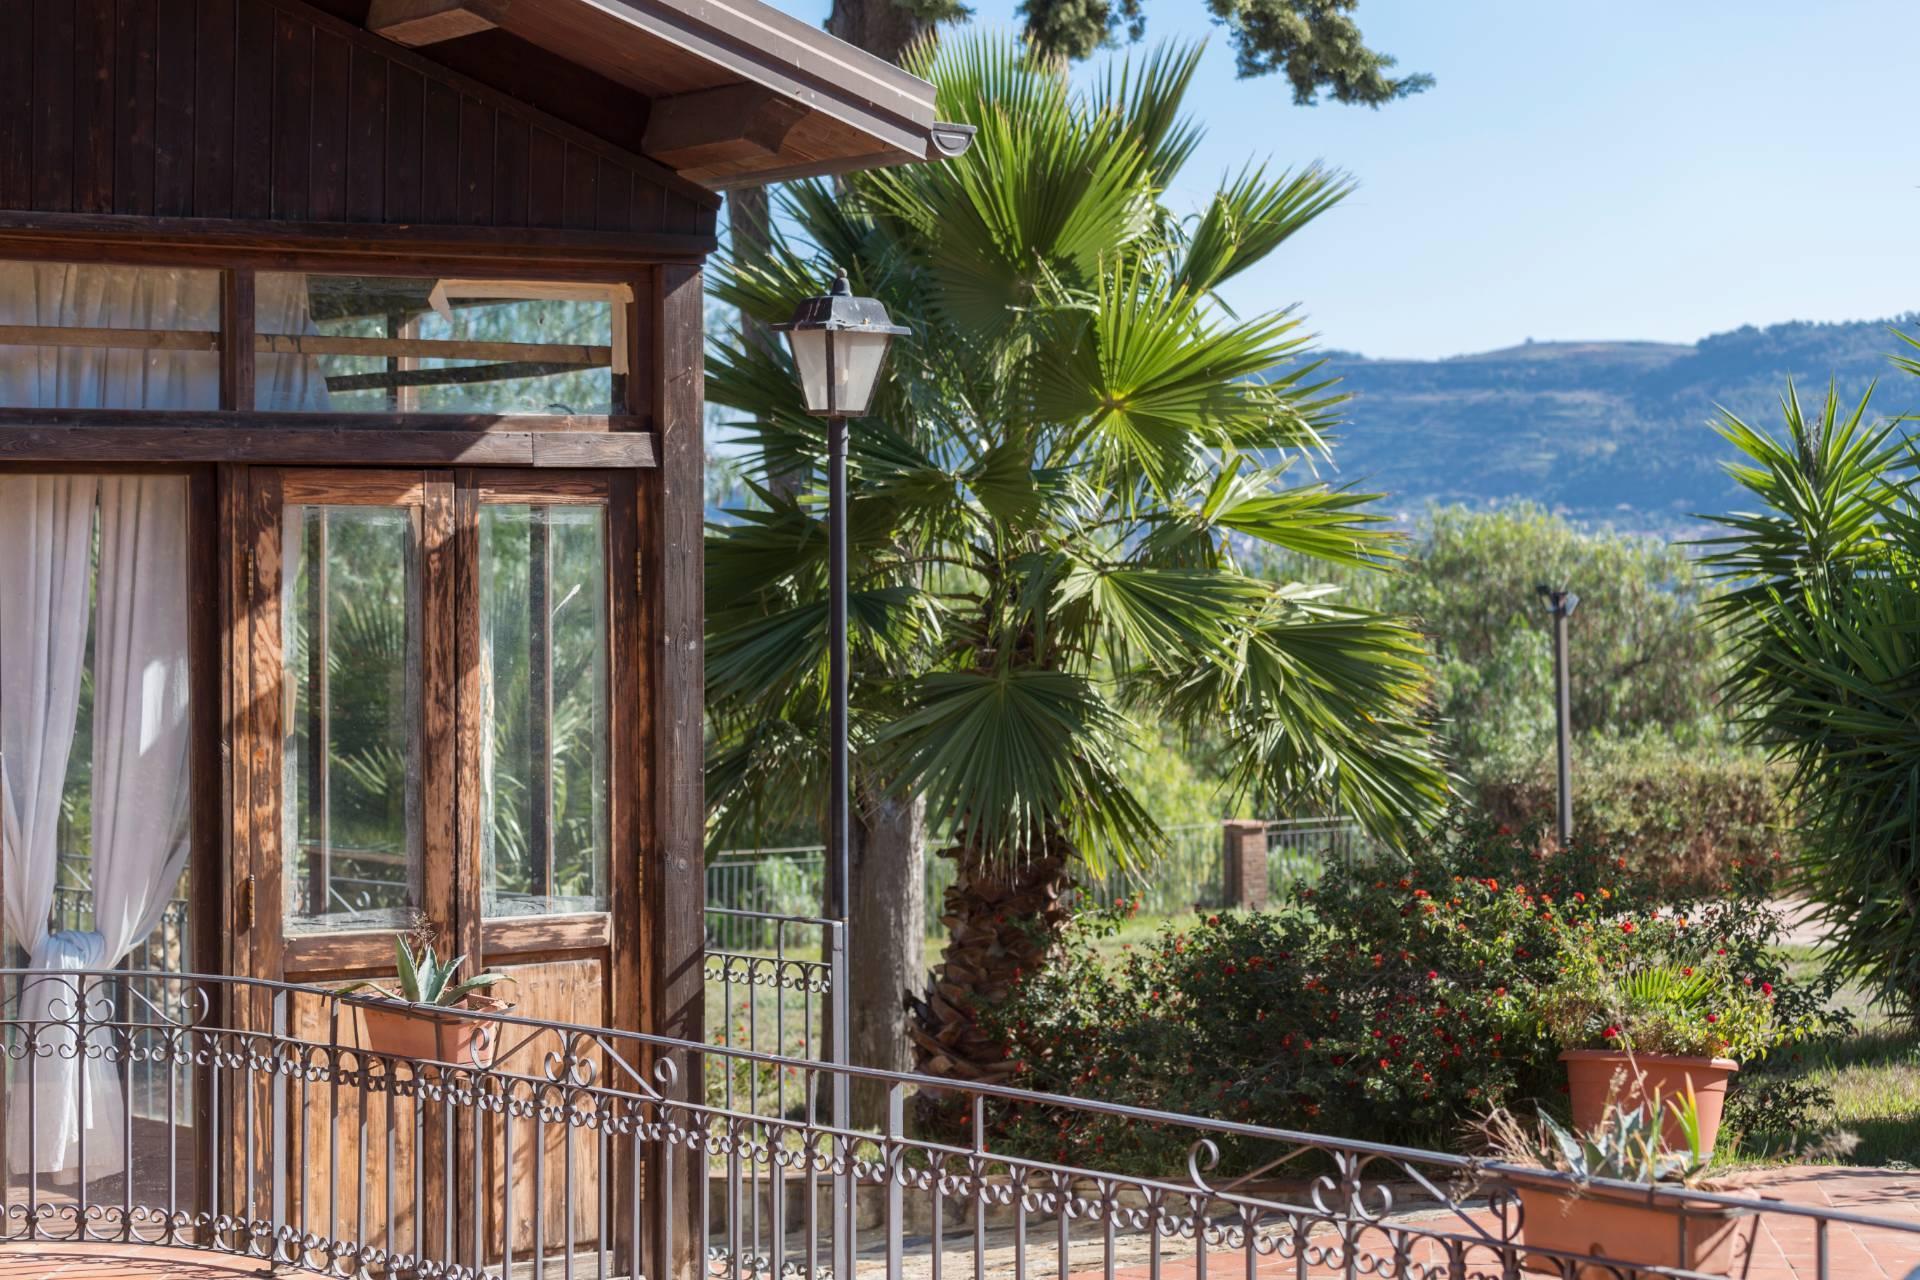 Villa in Vendita a Piazza Armerina: 5 locali, 550 mq - Foto 14